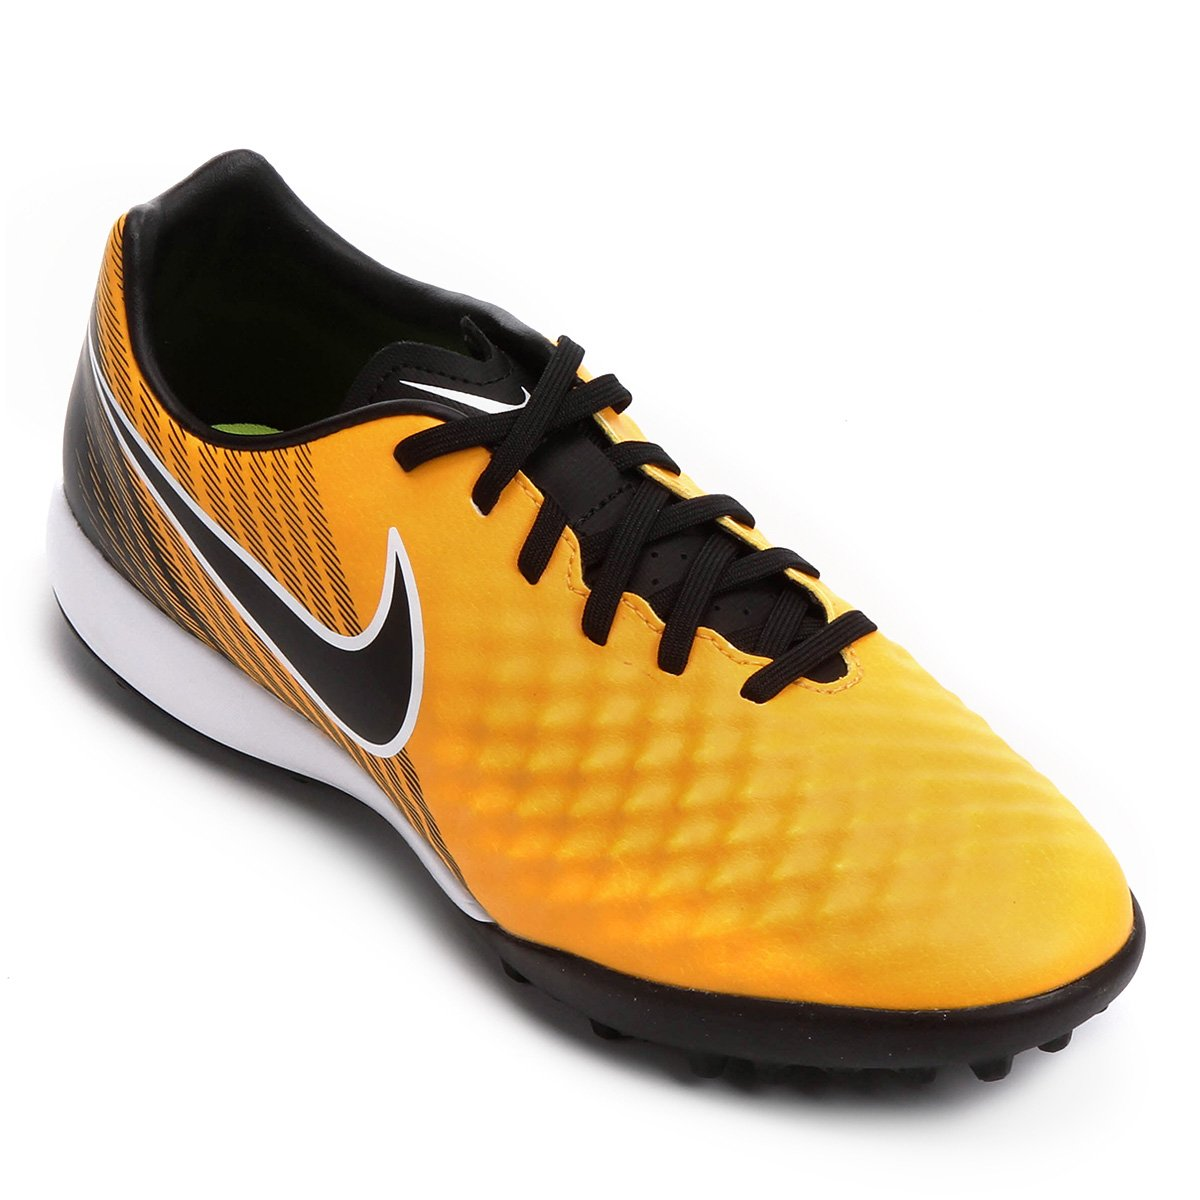 Chuteira Society Nike Magista Onda II TF - Laranja e Preto - Compre ... a1220393b7c1c